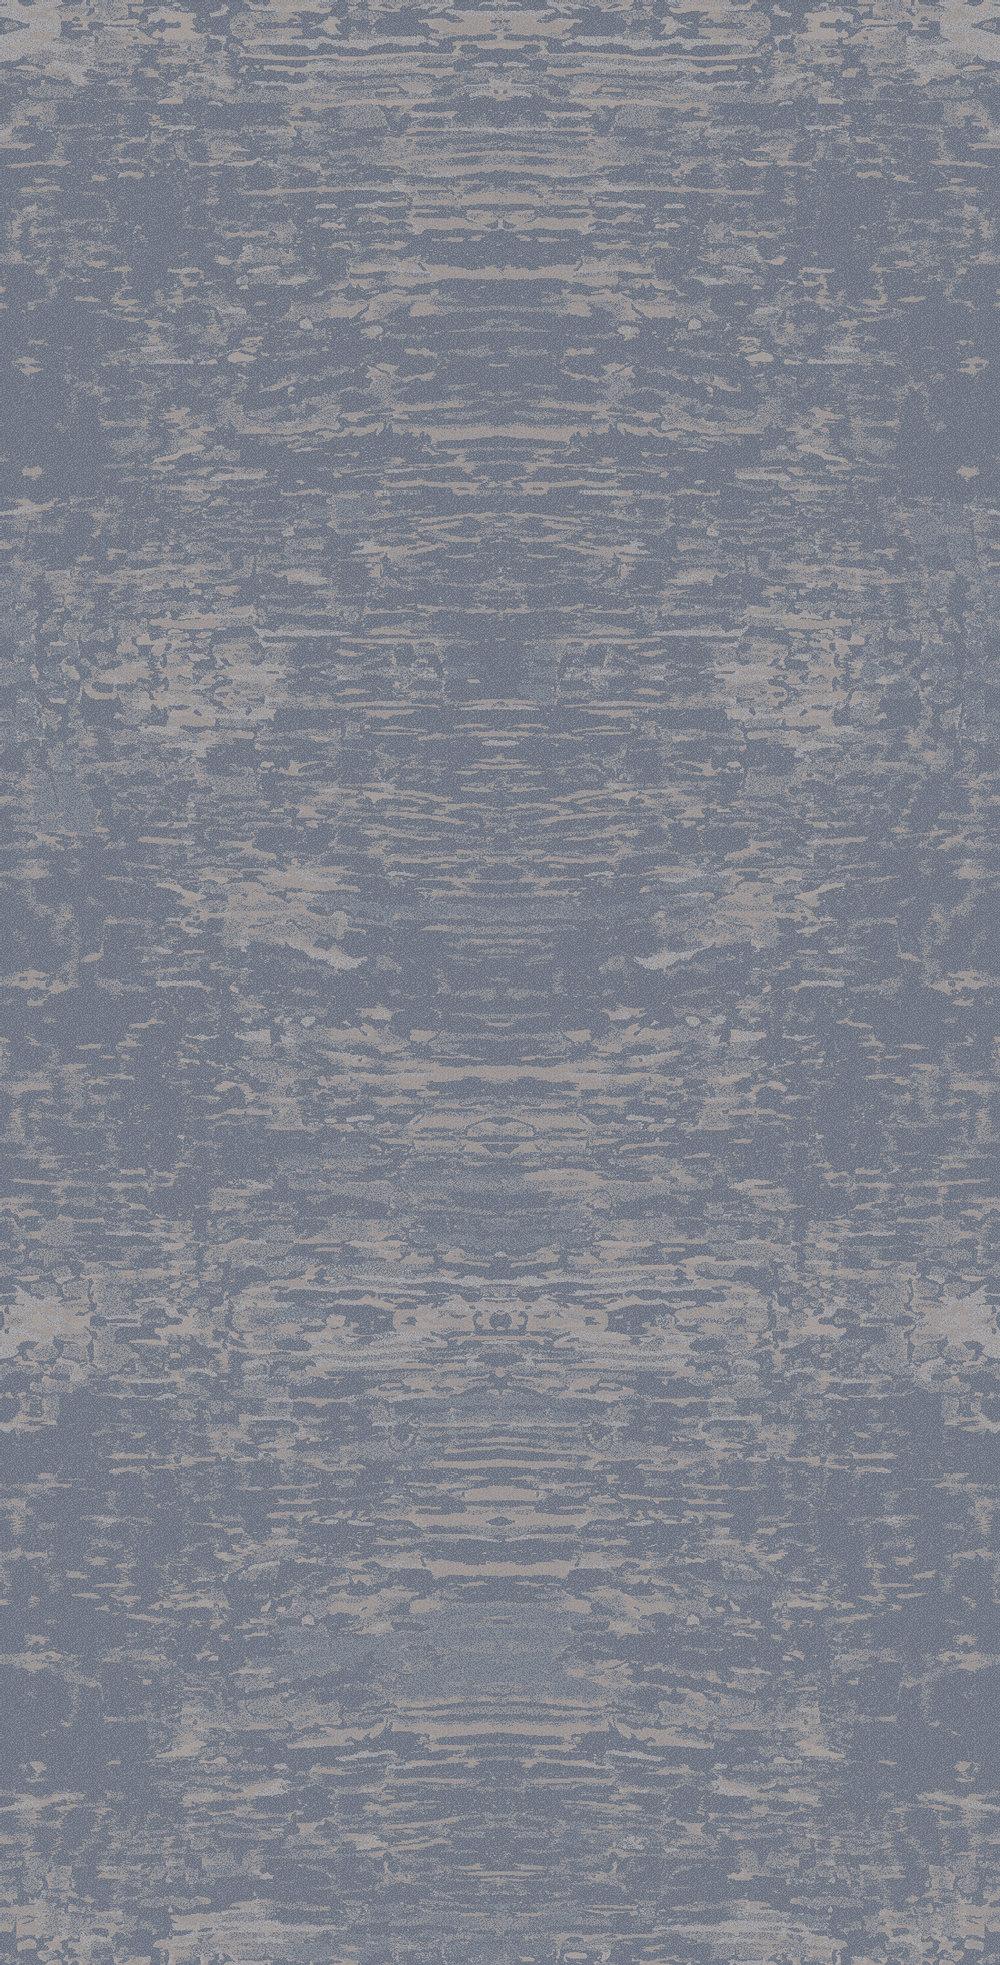 Axminster- NA-025027r1